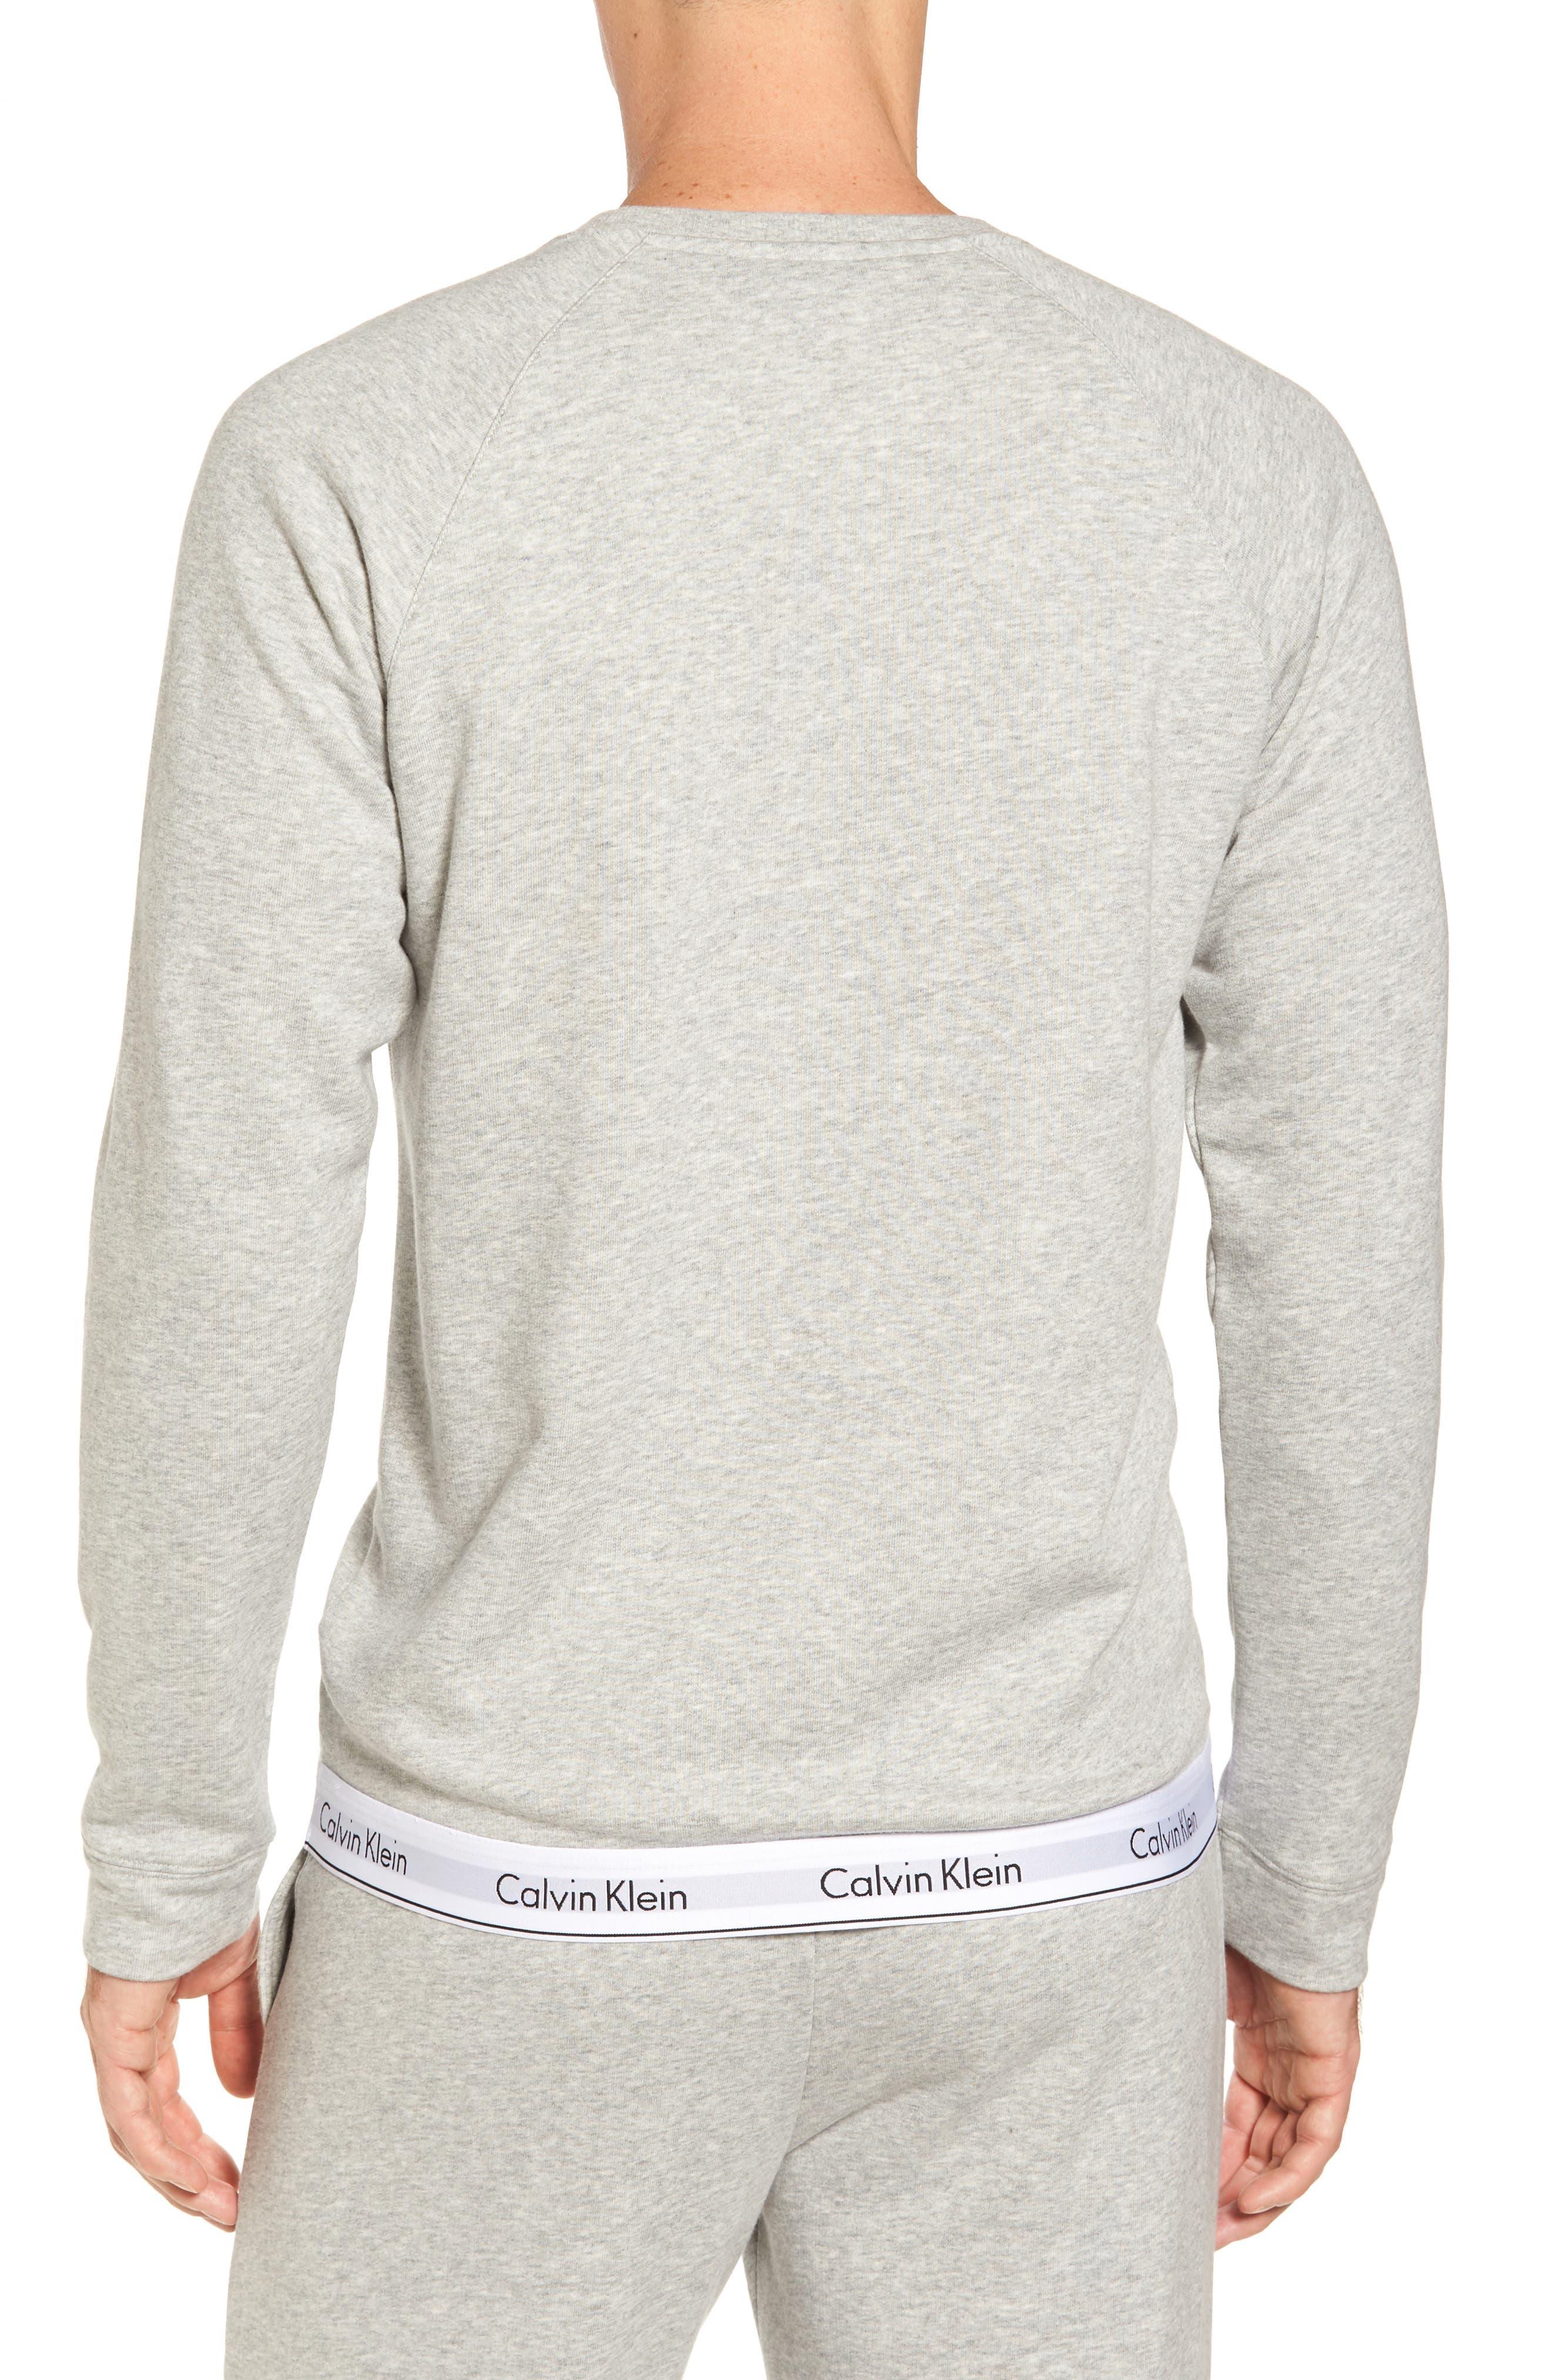 Lounge Crewneck Sweatshirt,                             Alternate thumbnail 2, color,                             Grey Heather